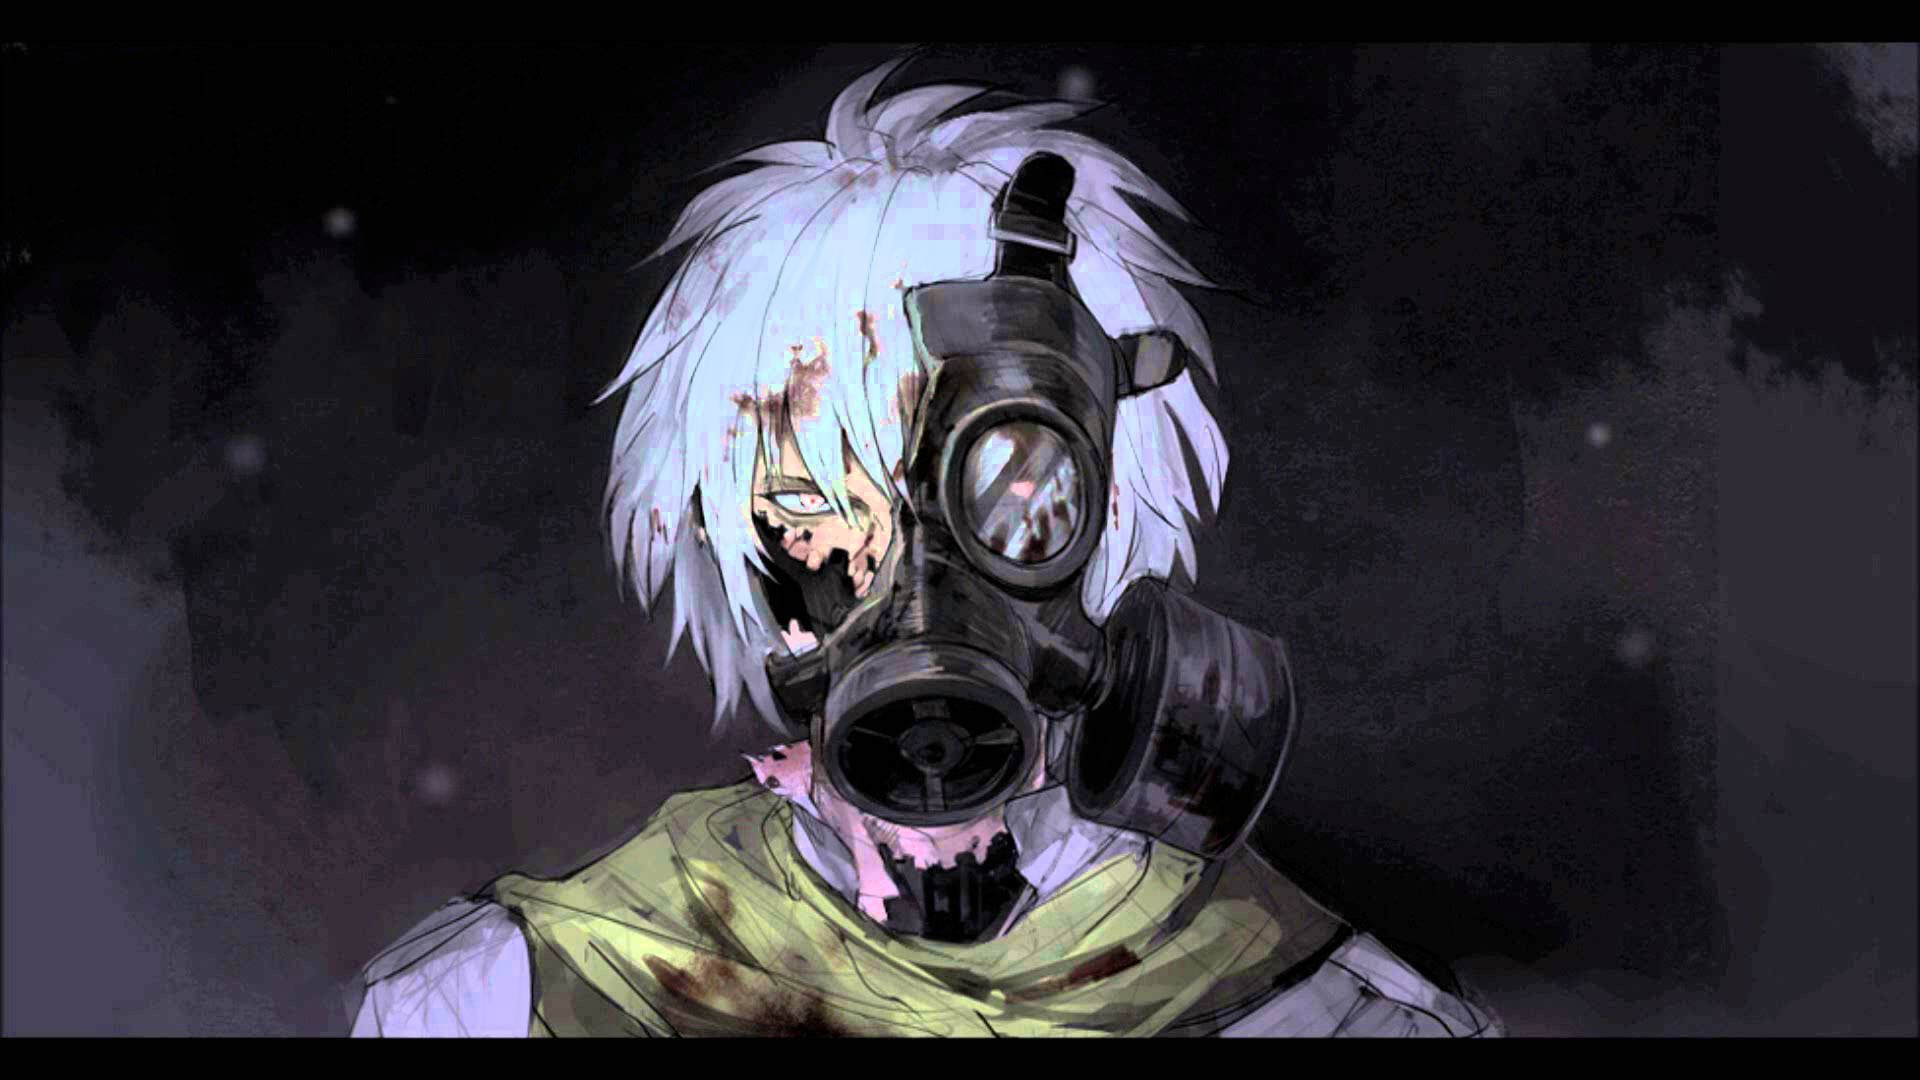 Remove The Masks